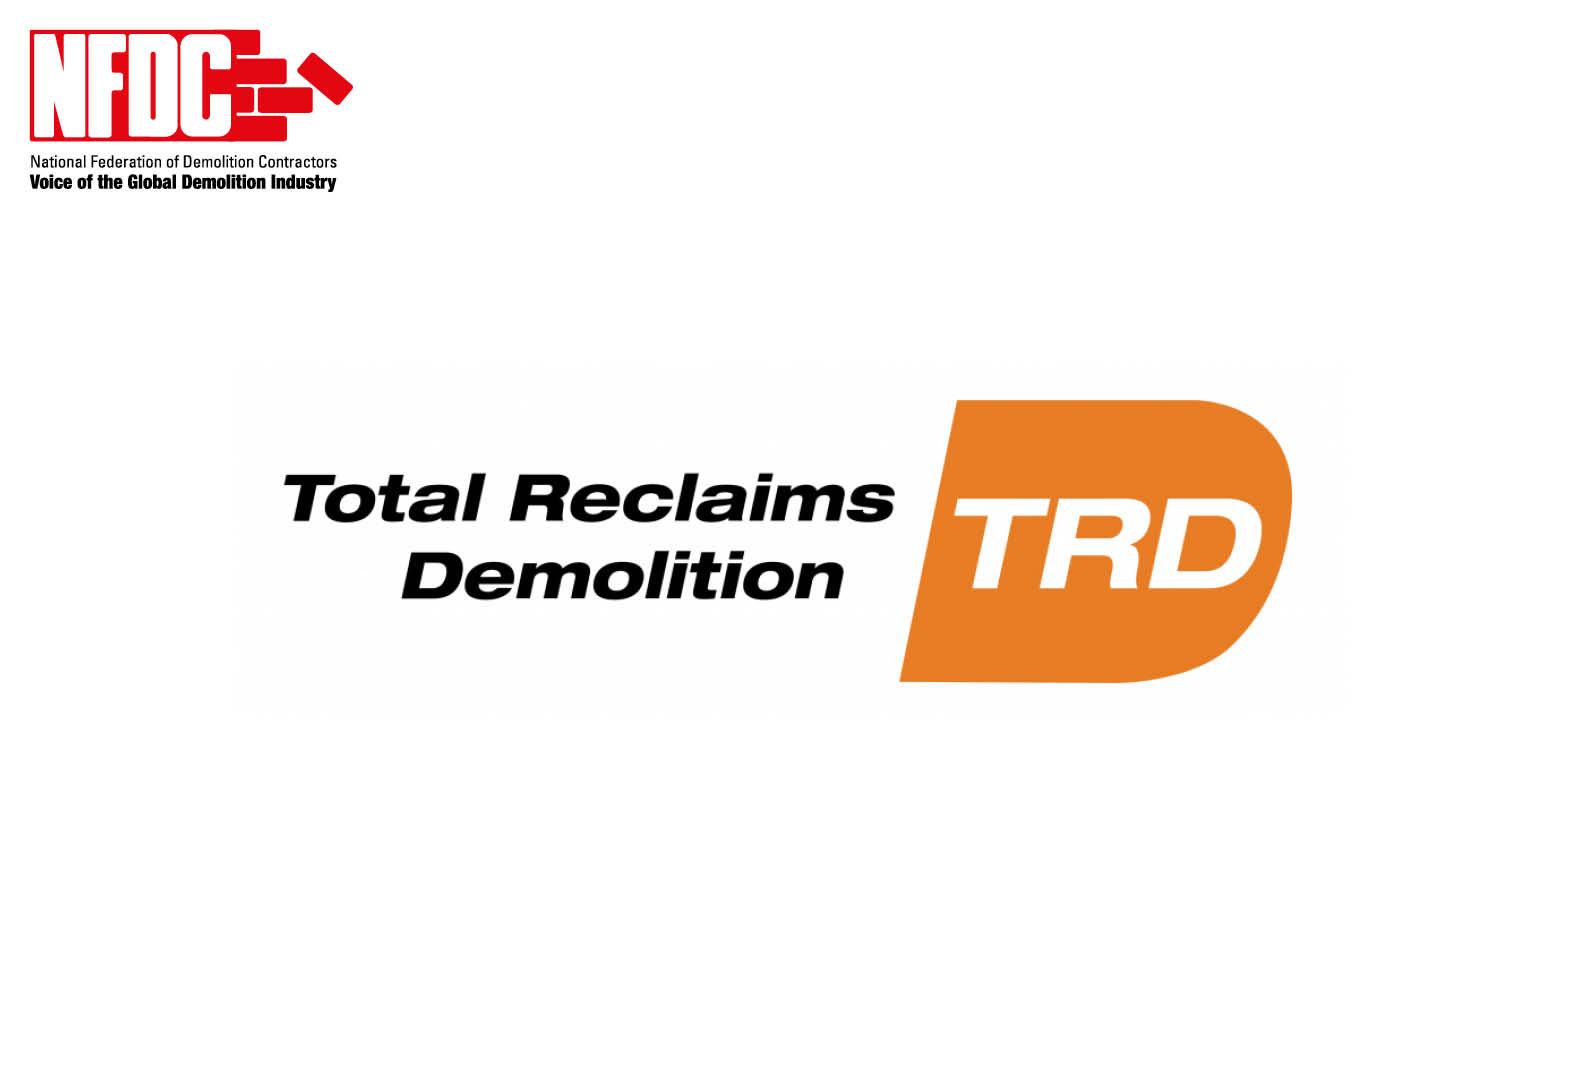 Total Reclaims